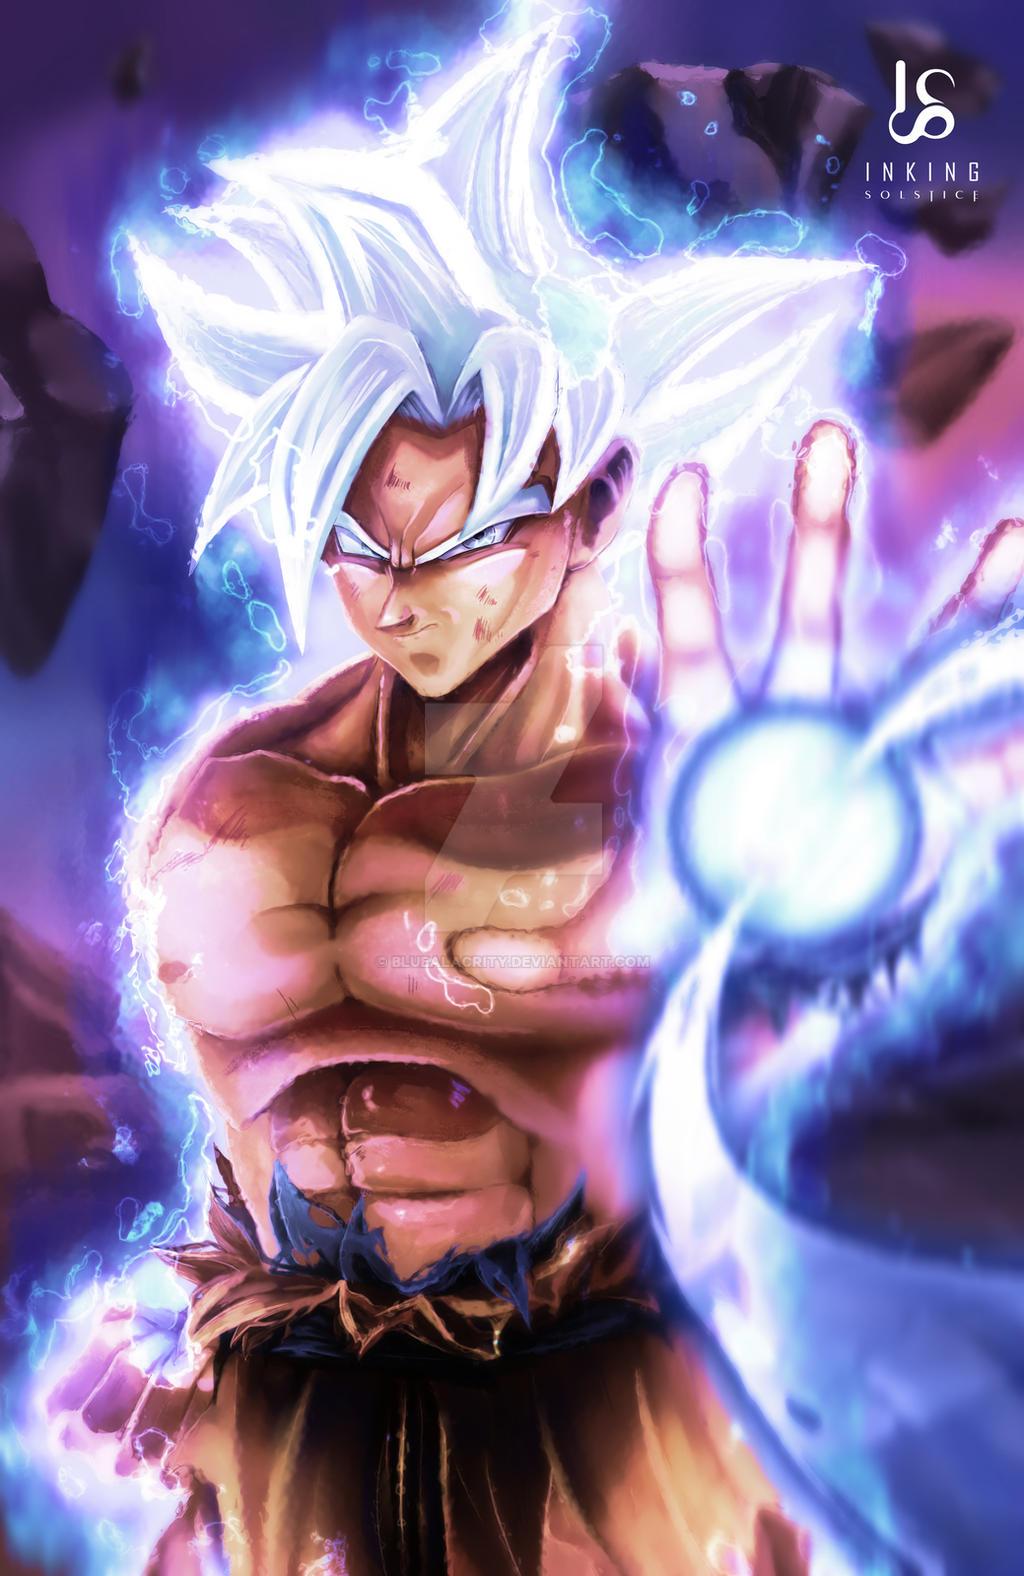 Mastered ultra instinct goku by bluealacrity on deviantart - Goku ultra instinct mastered wallpaper ...